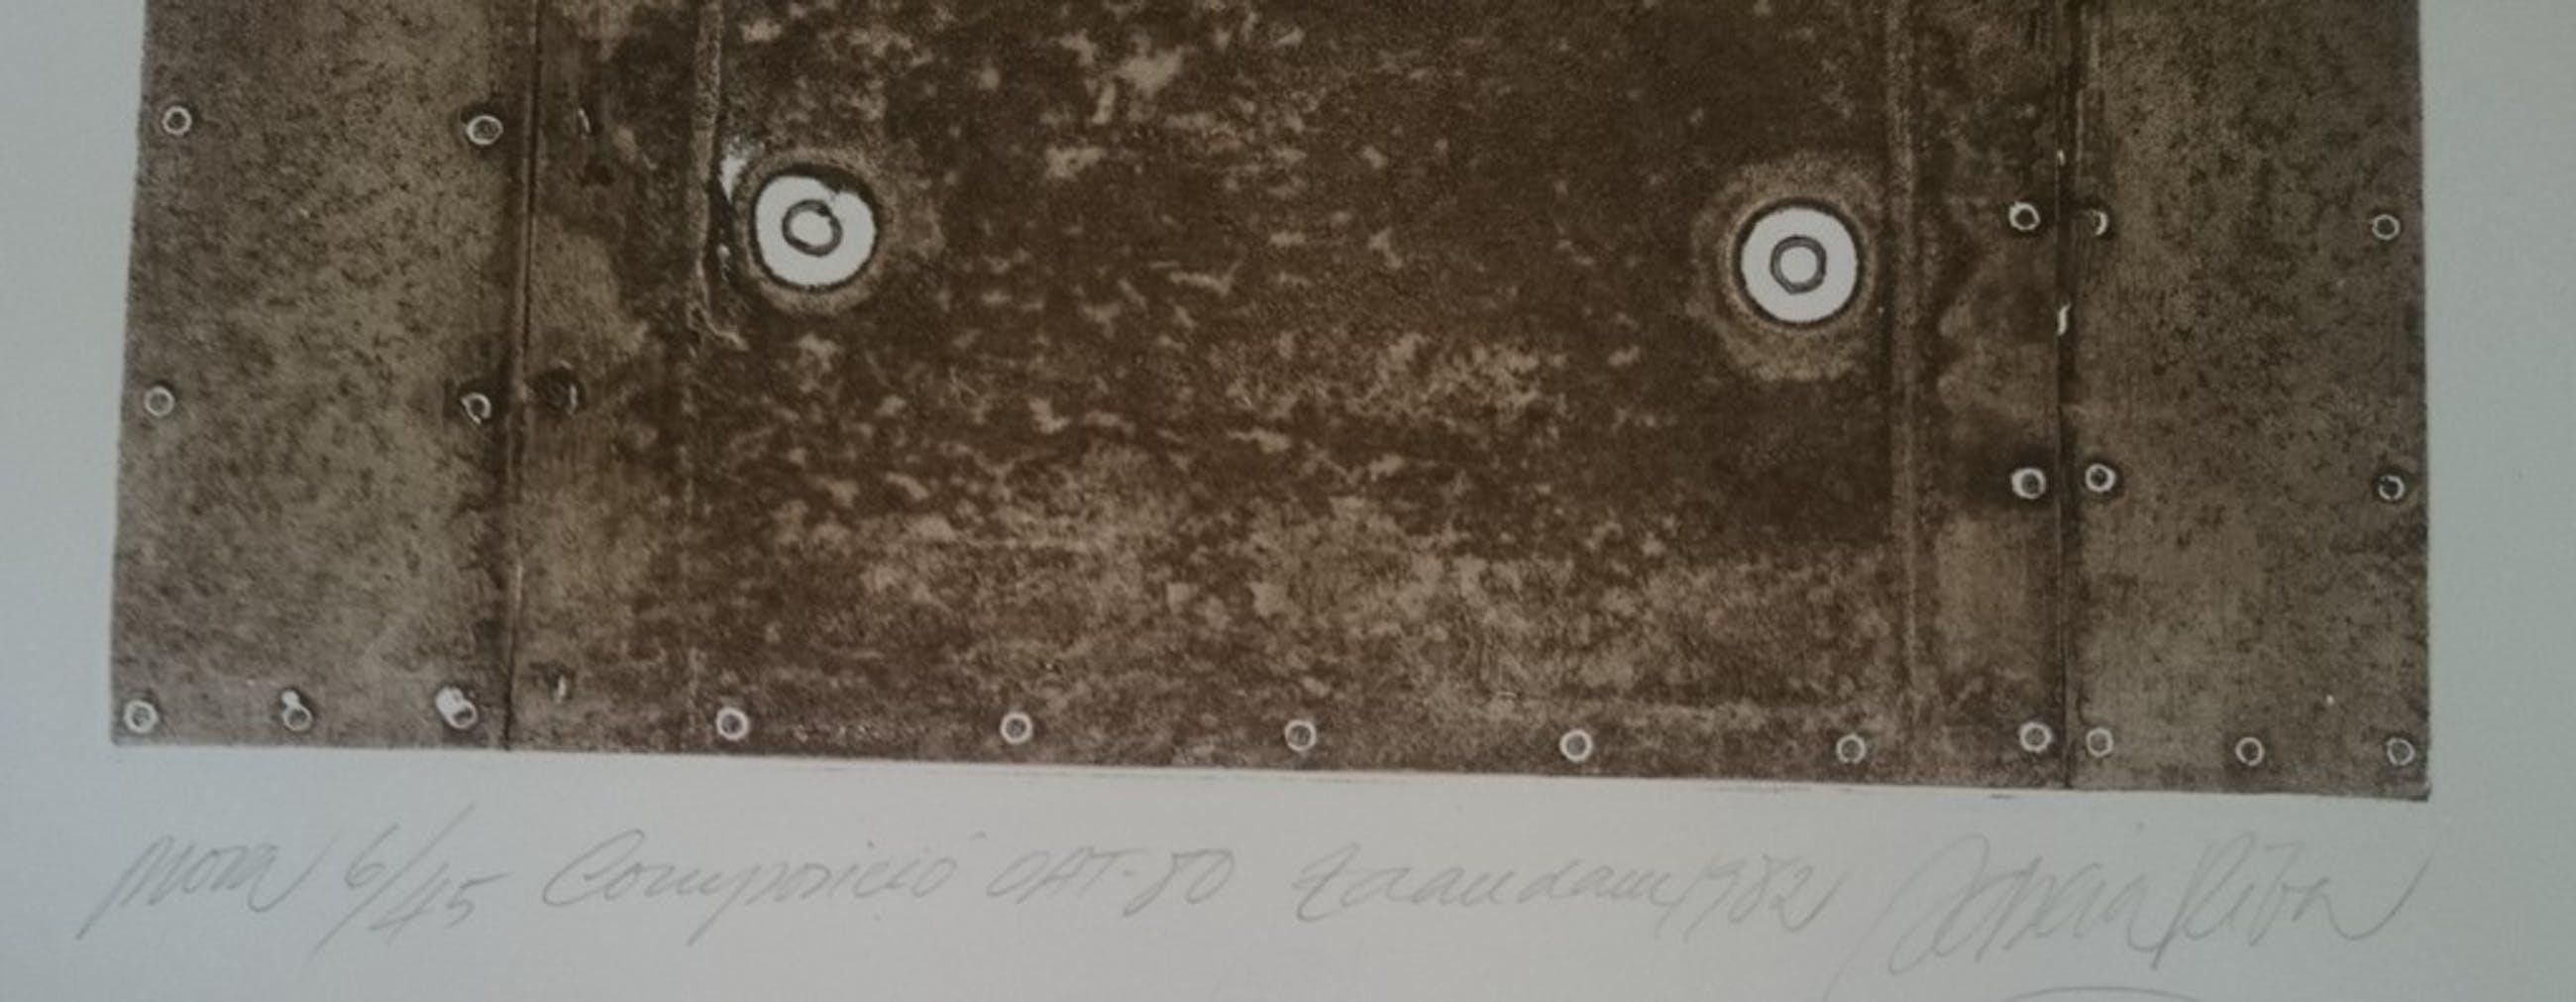 Enric Adsera Riba, ets , compositie Oat-80 1982 kopen? Bied vanaf 20!